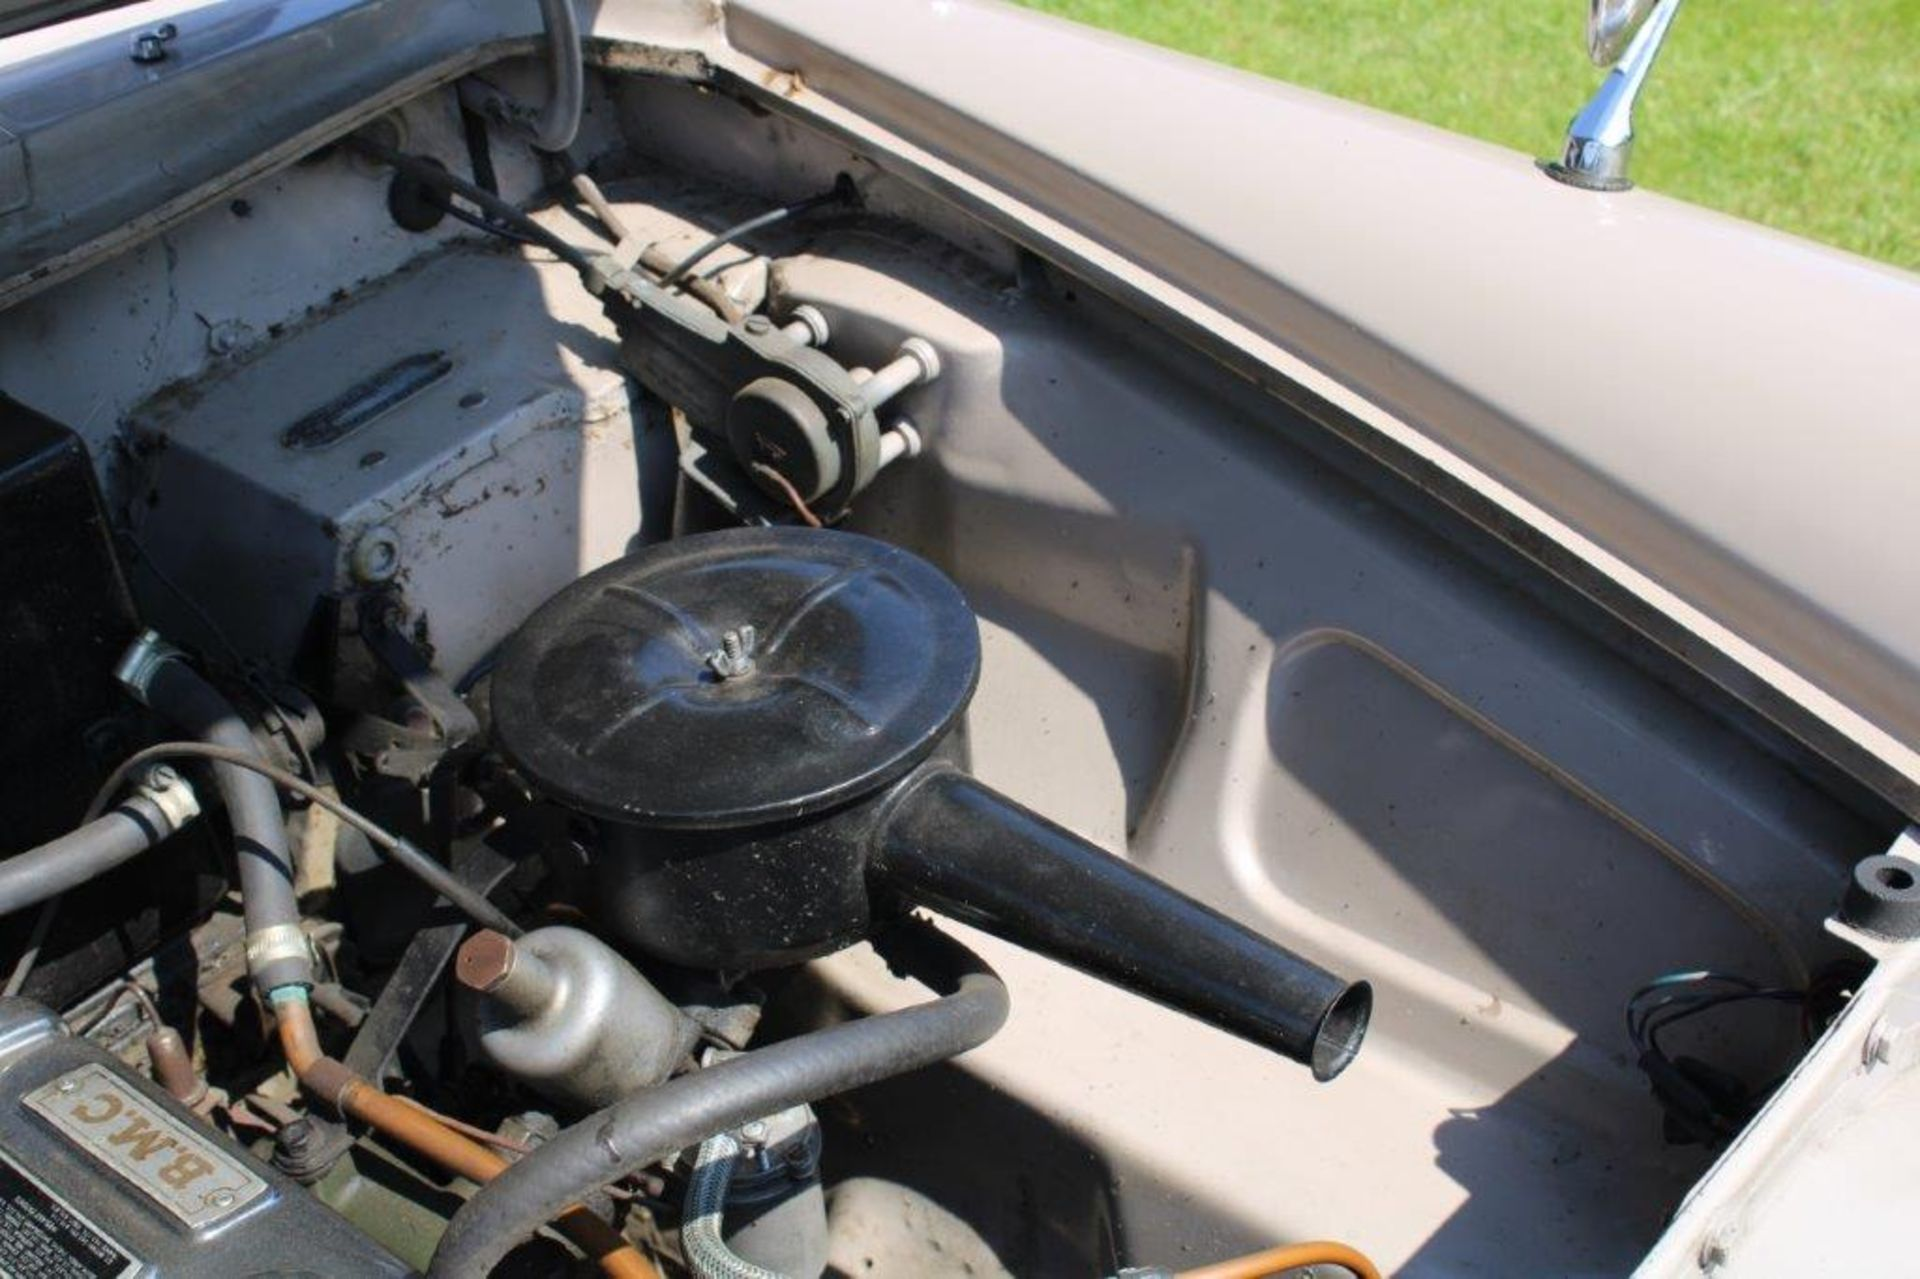 1969 Wolseley 16/60 Auto - Image 24 of 31